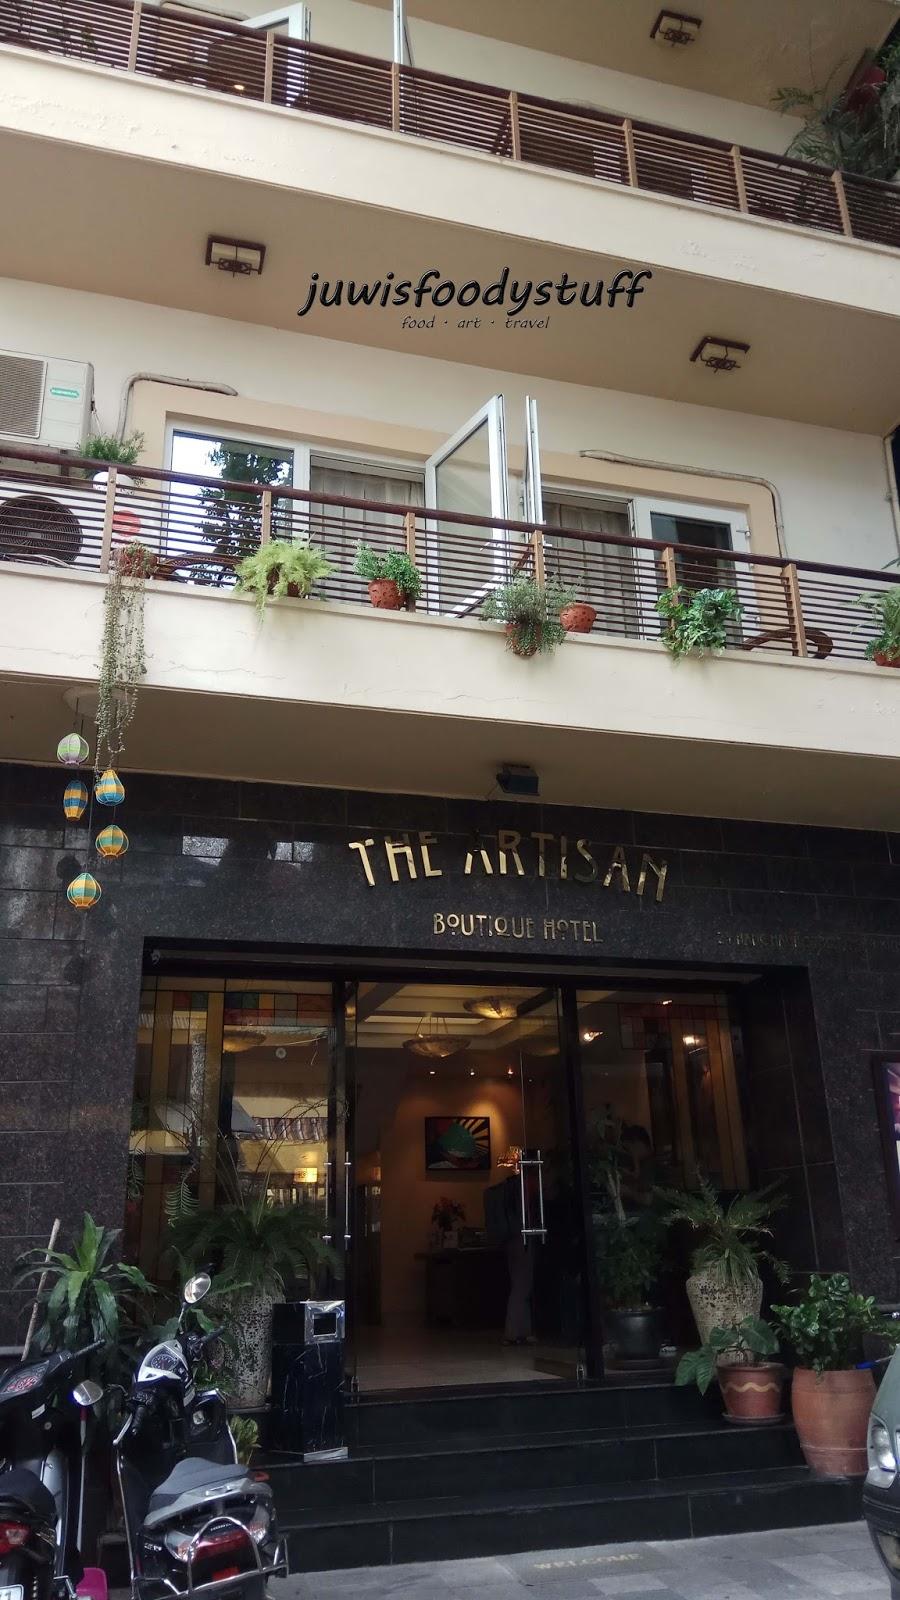 33 Boutique Hotel Juwisfoodystuff